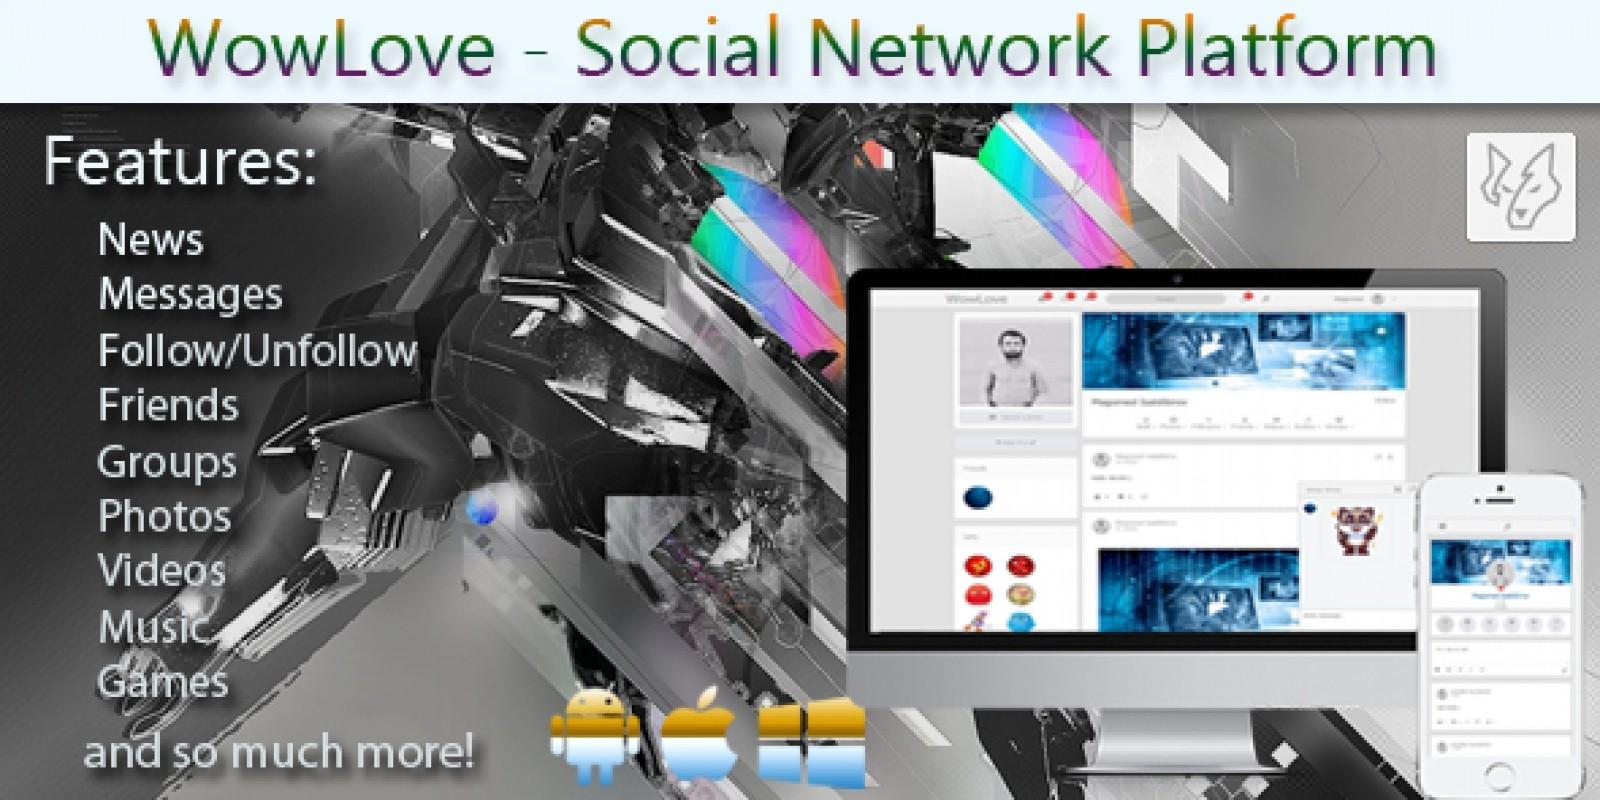 WowLove Social Network Platform